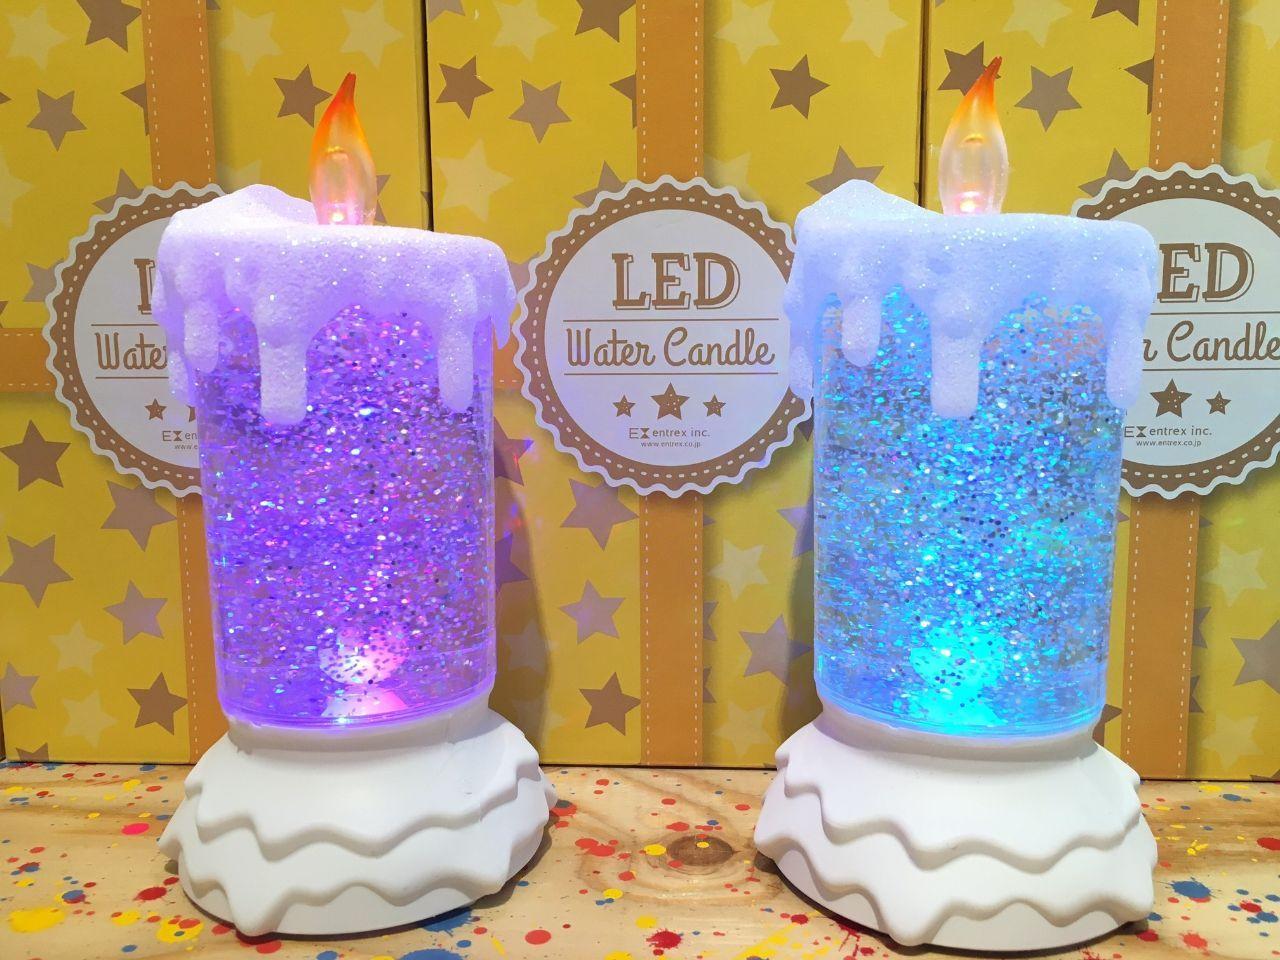 「LEDグリッターキャンドル」の写真